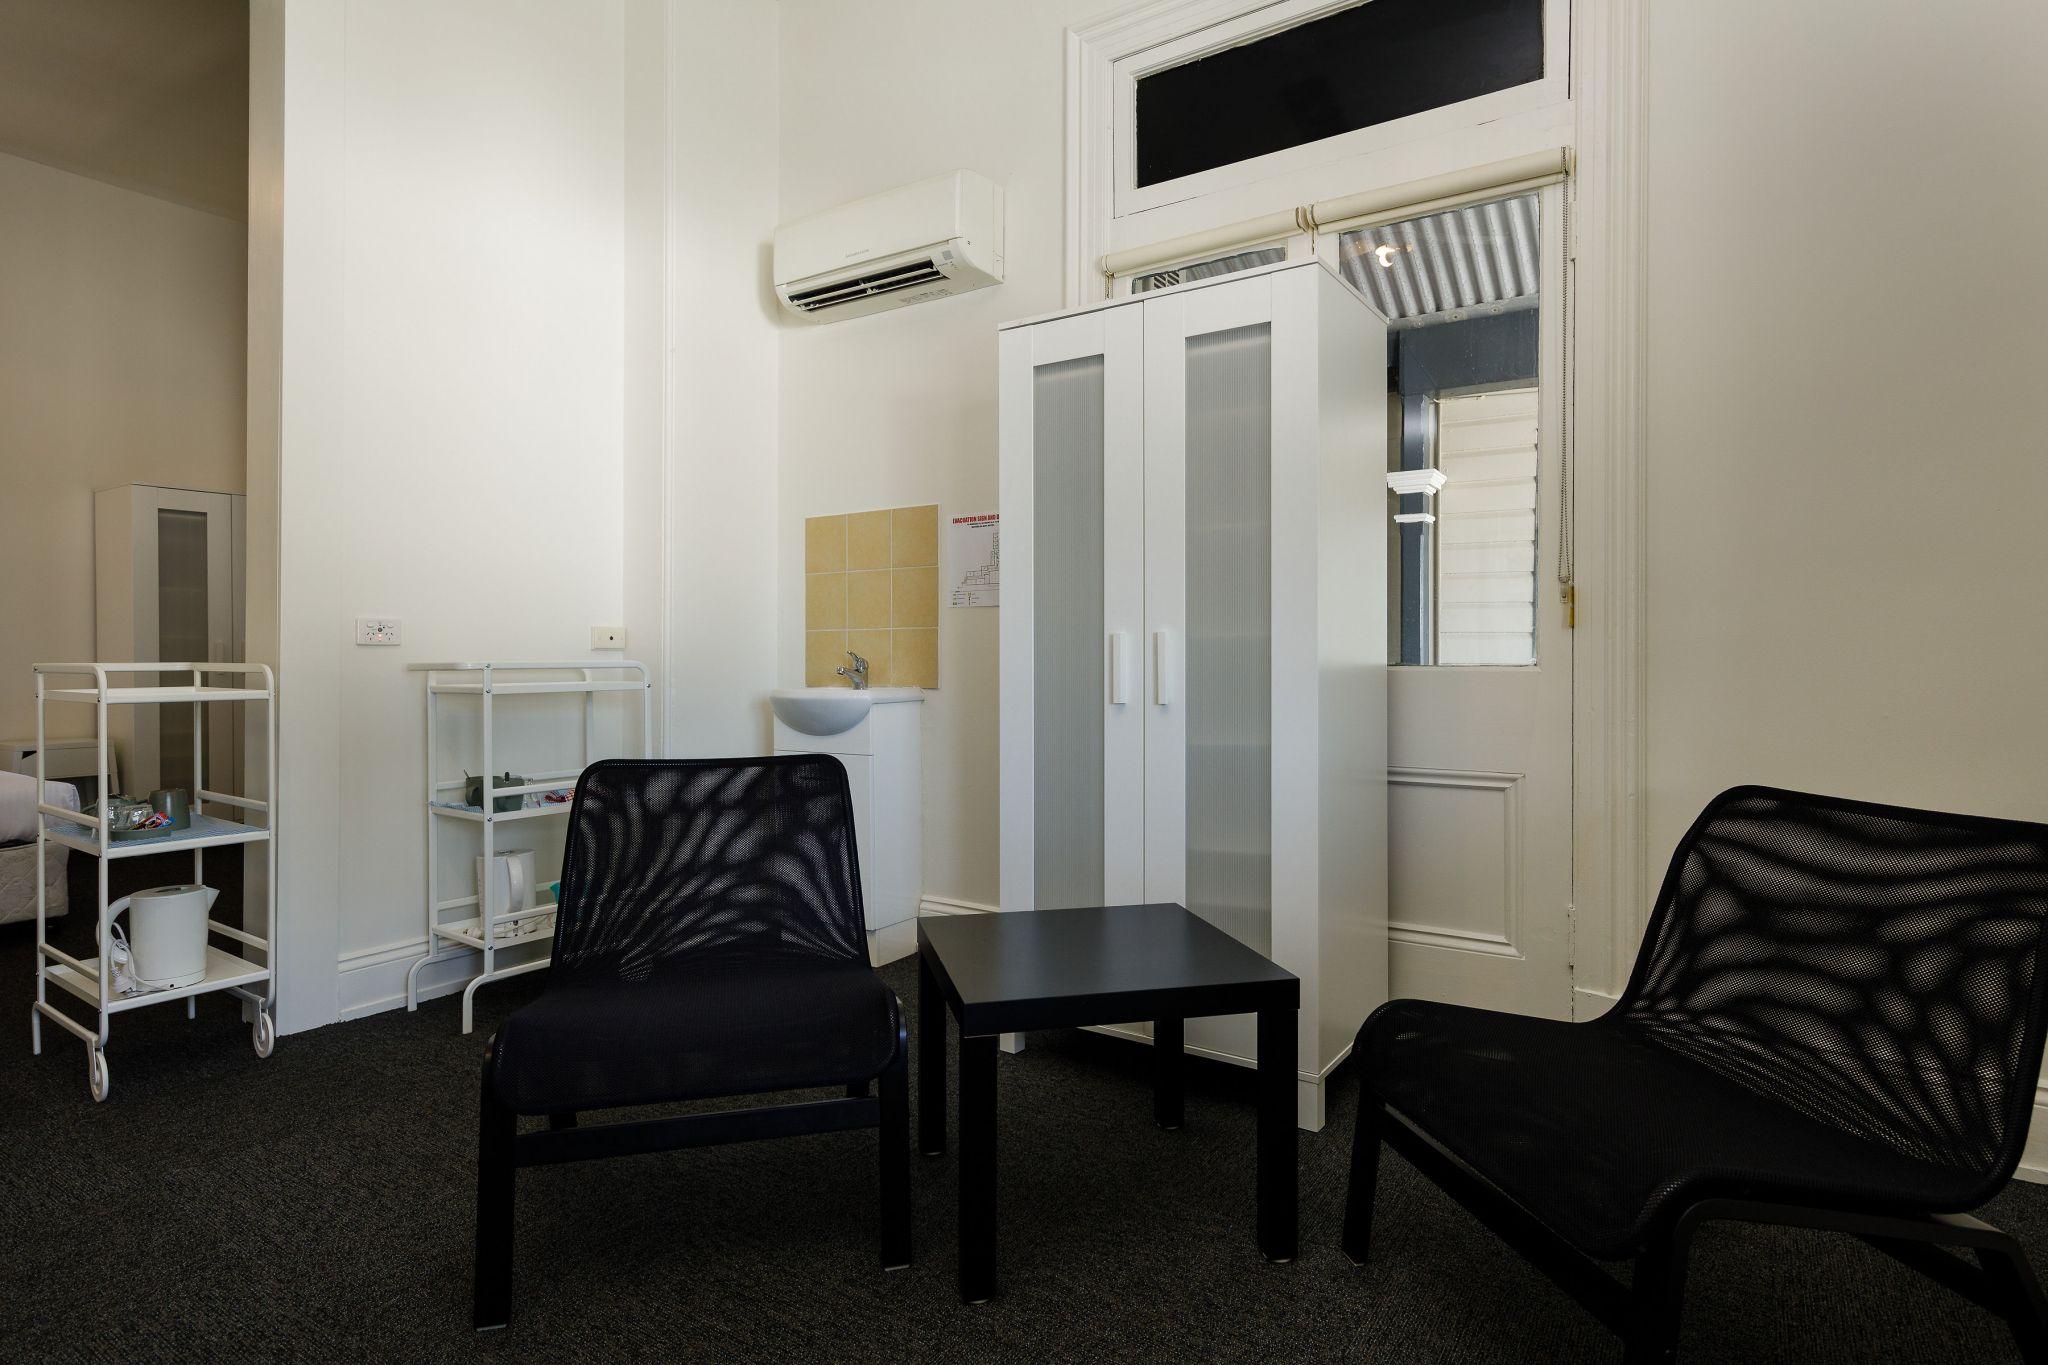 Waterloo Bay Hotel - Pub Accommodation - Family Pub Room 4